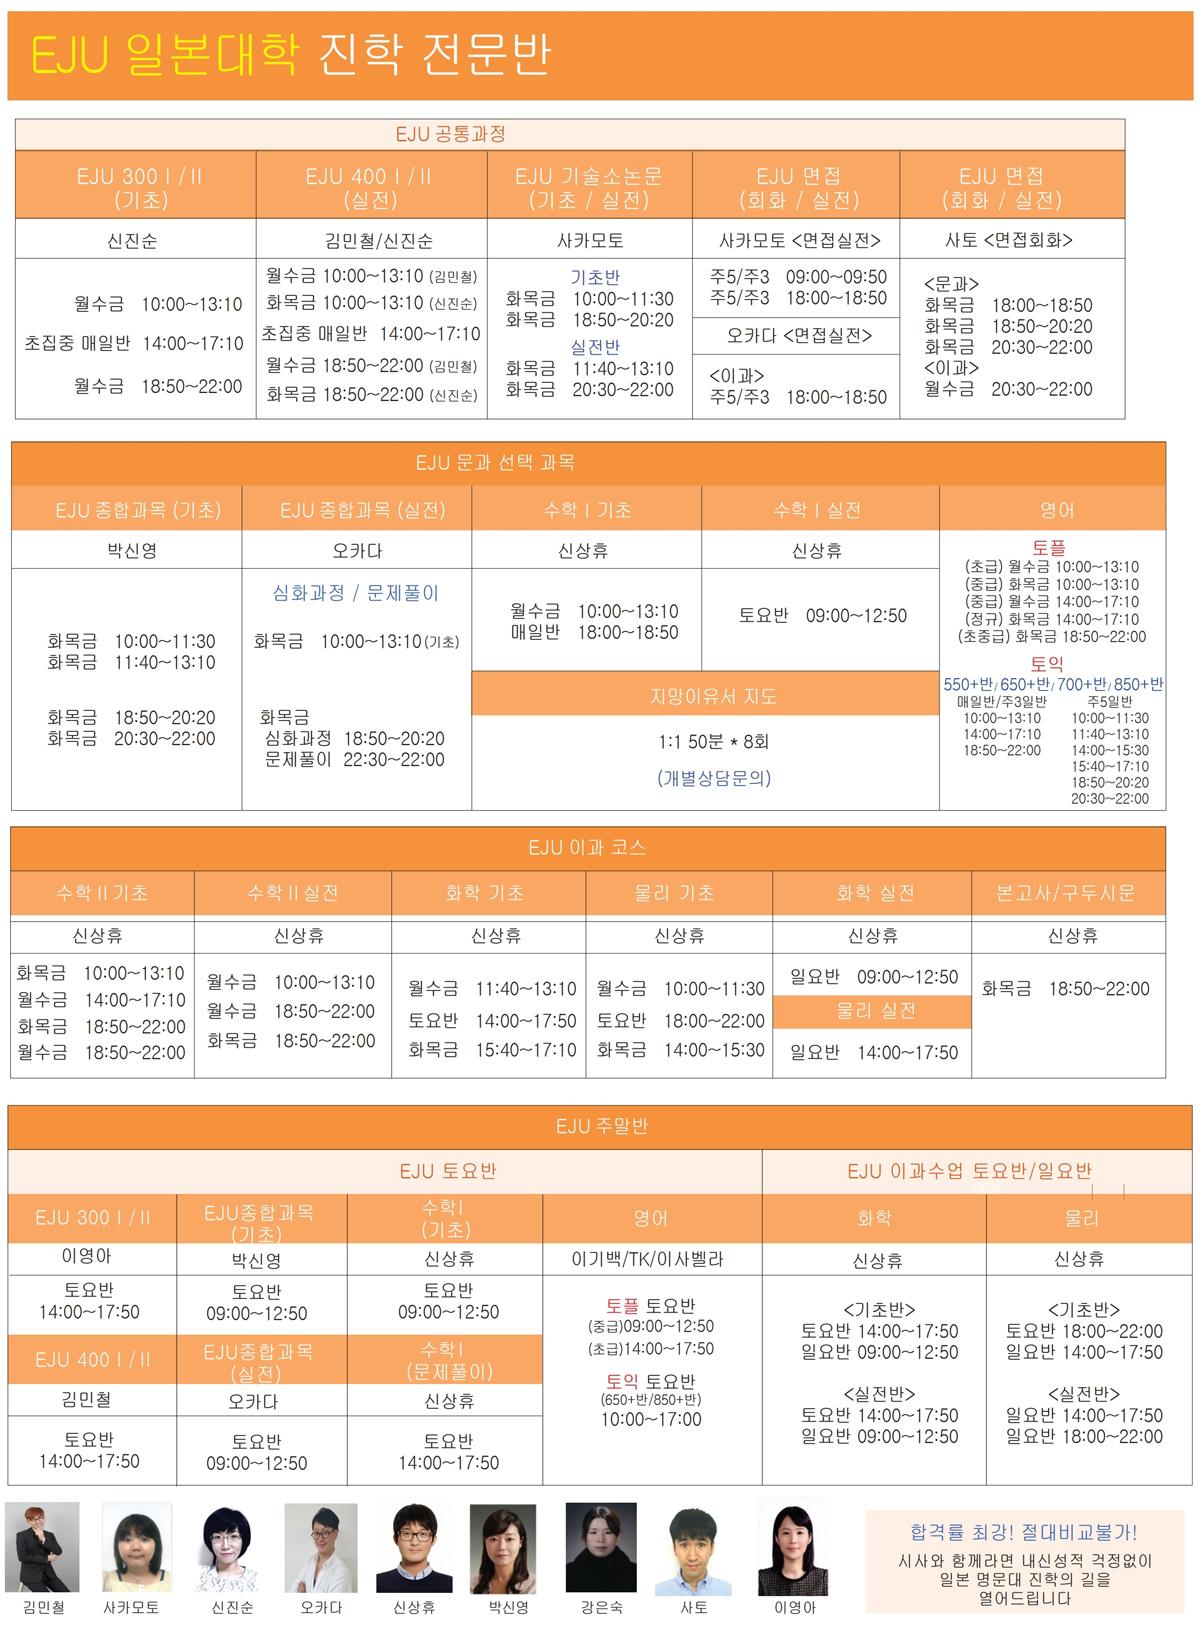 6 EJU일본대학진학전문반.pdf_page_1.jpg